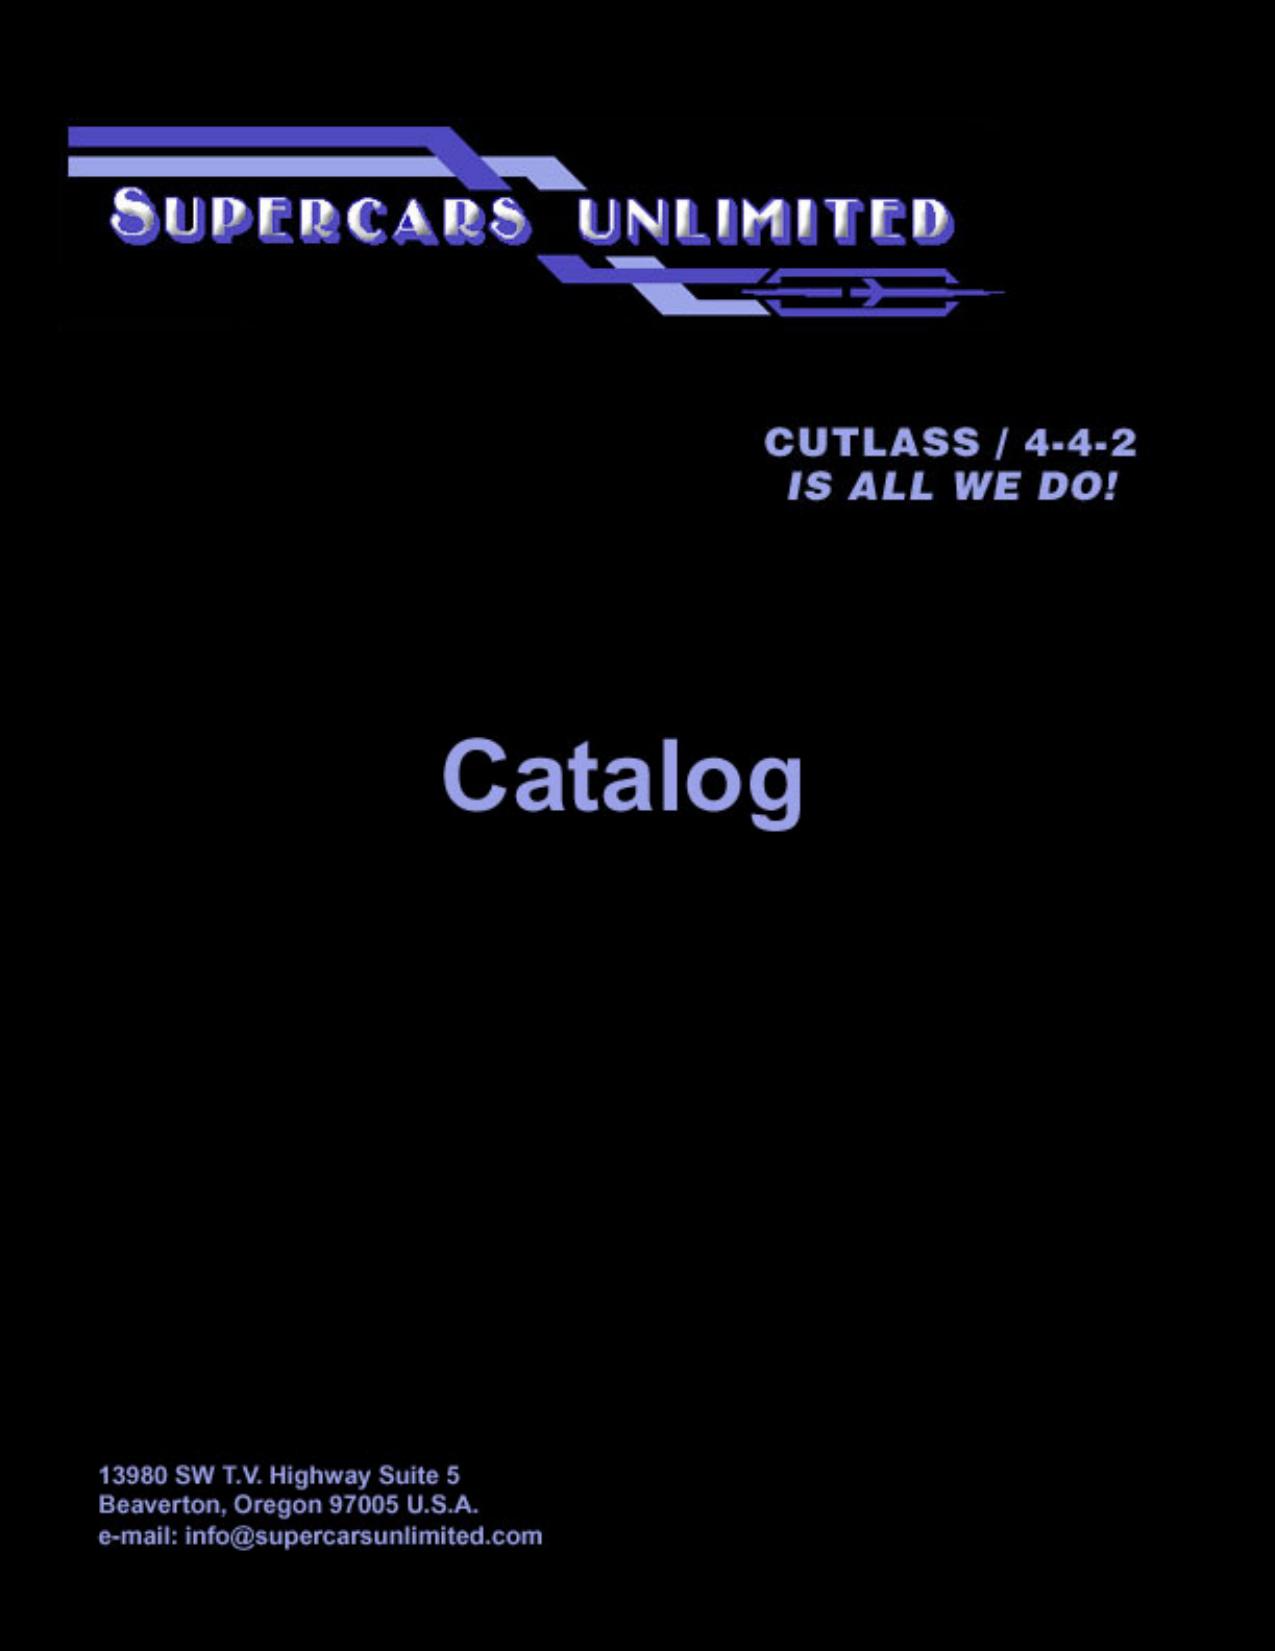 1964-72 Cutlass 442 W-30 W-31 Crankcase Pressure PCV Valve 350 400 455 Cars OEM